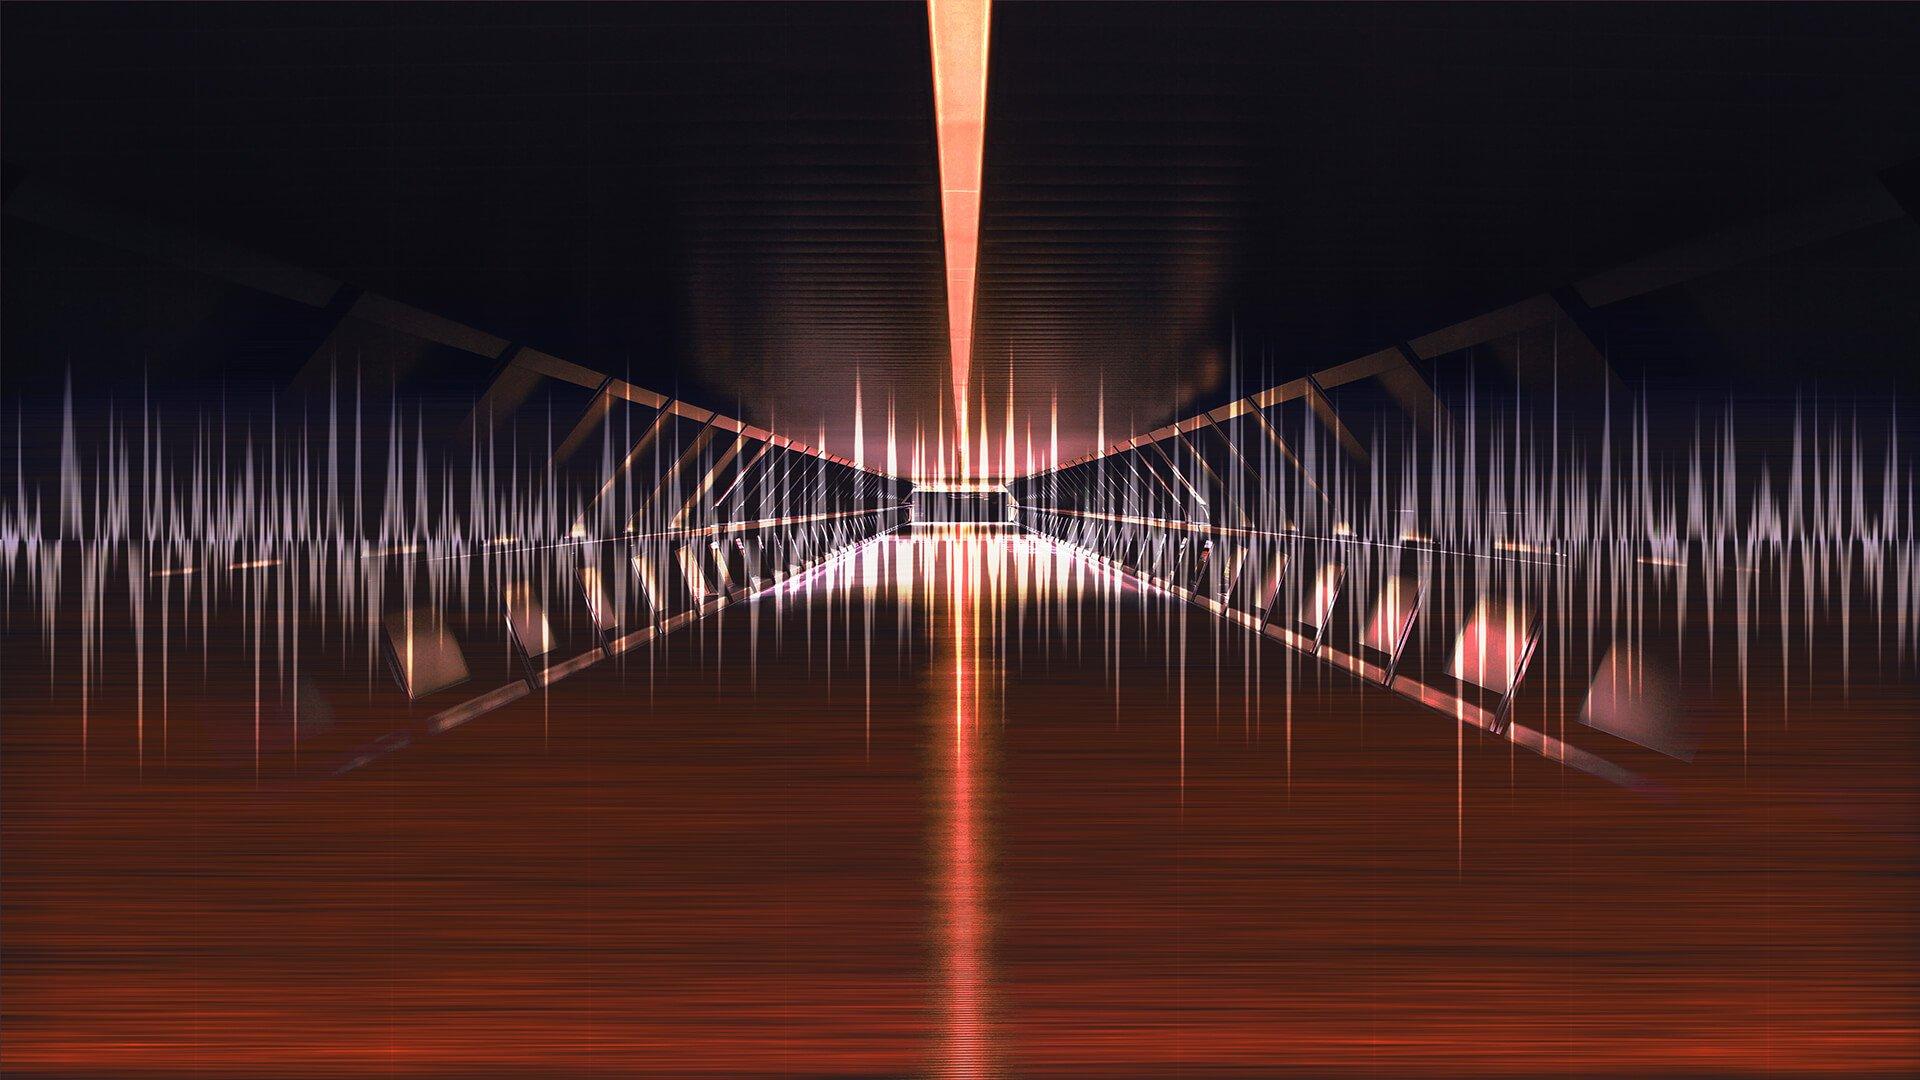 Image of Futuristic building bridge with waveform composite.